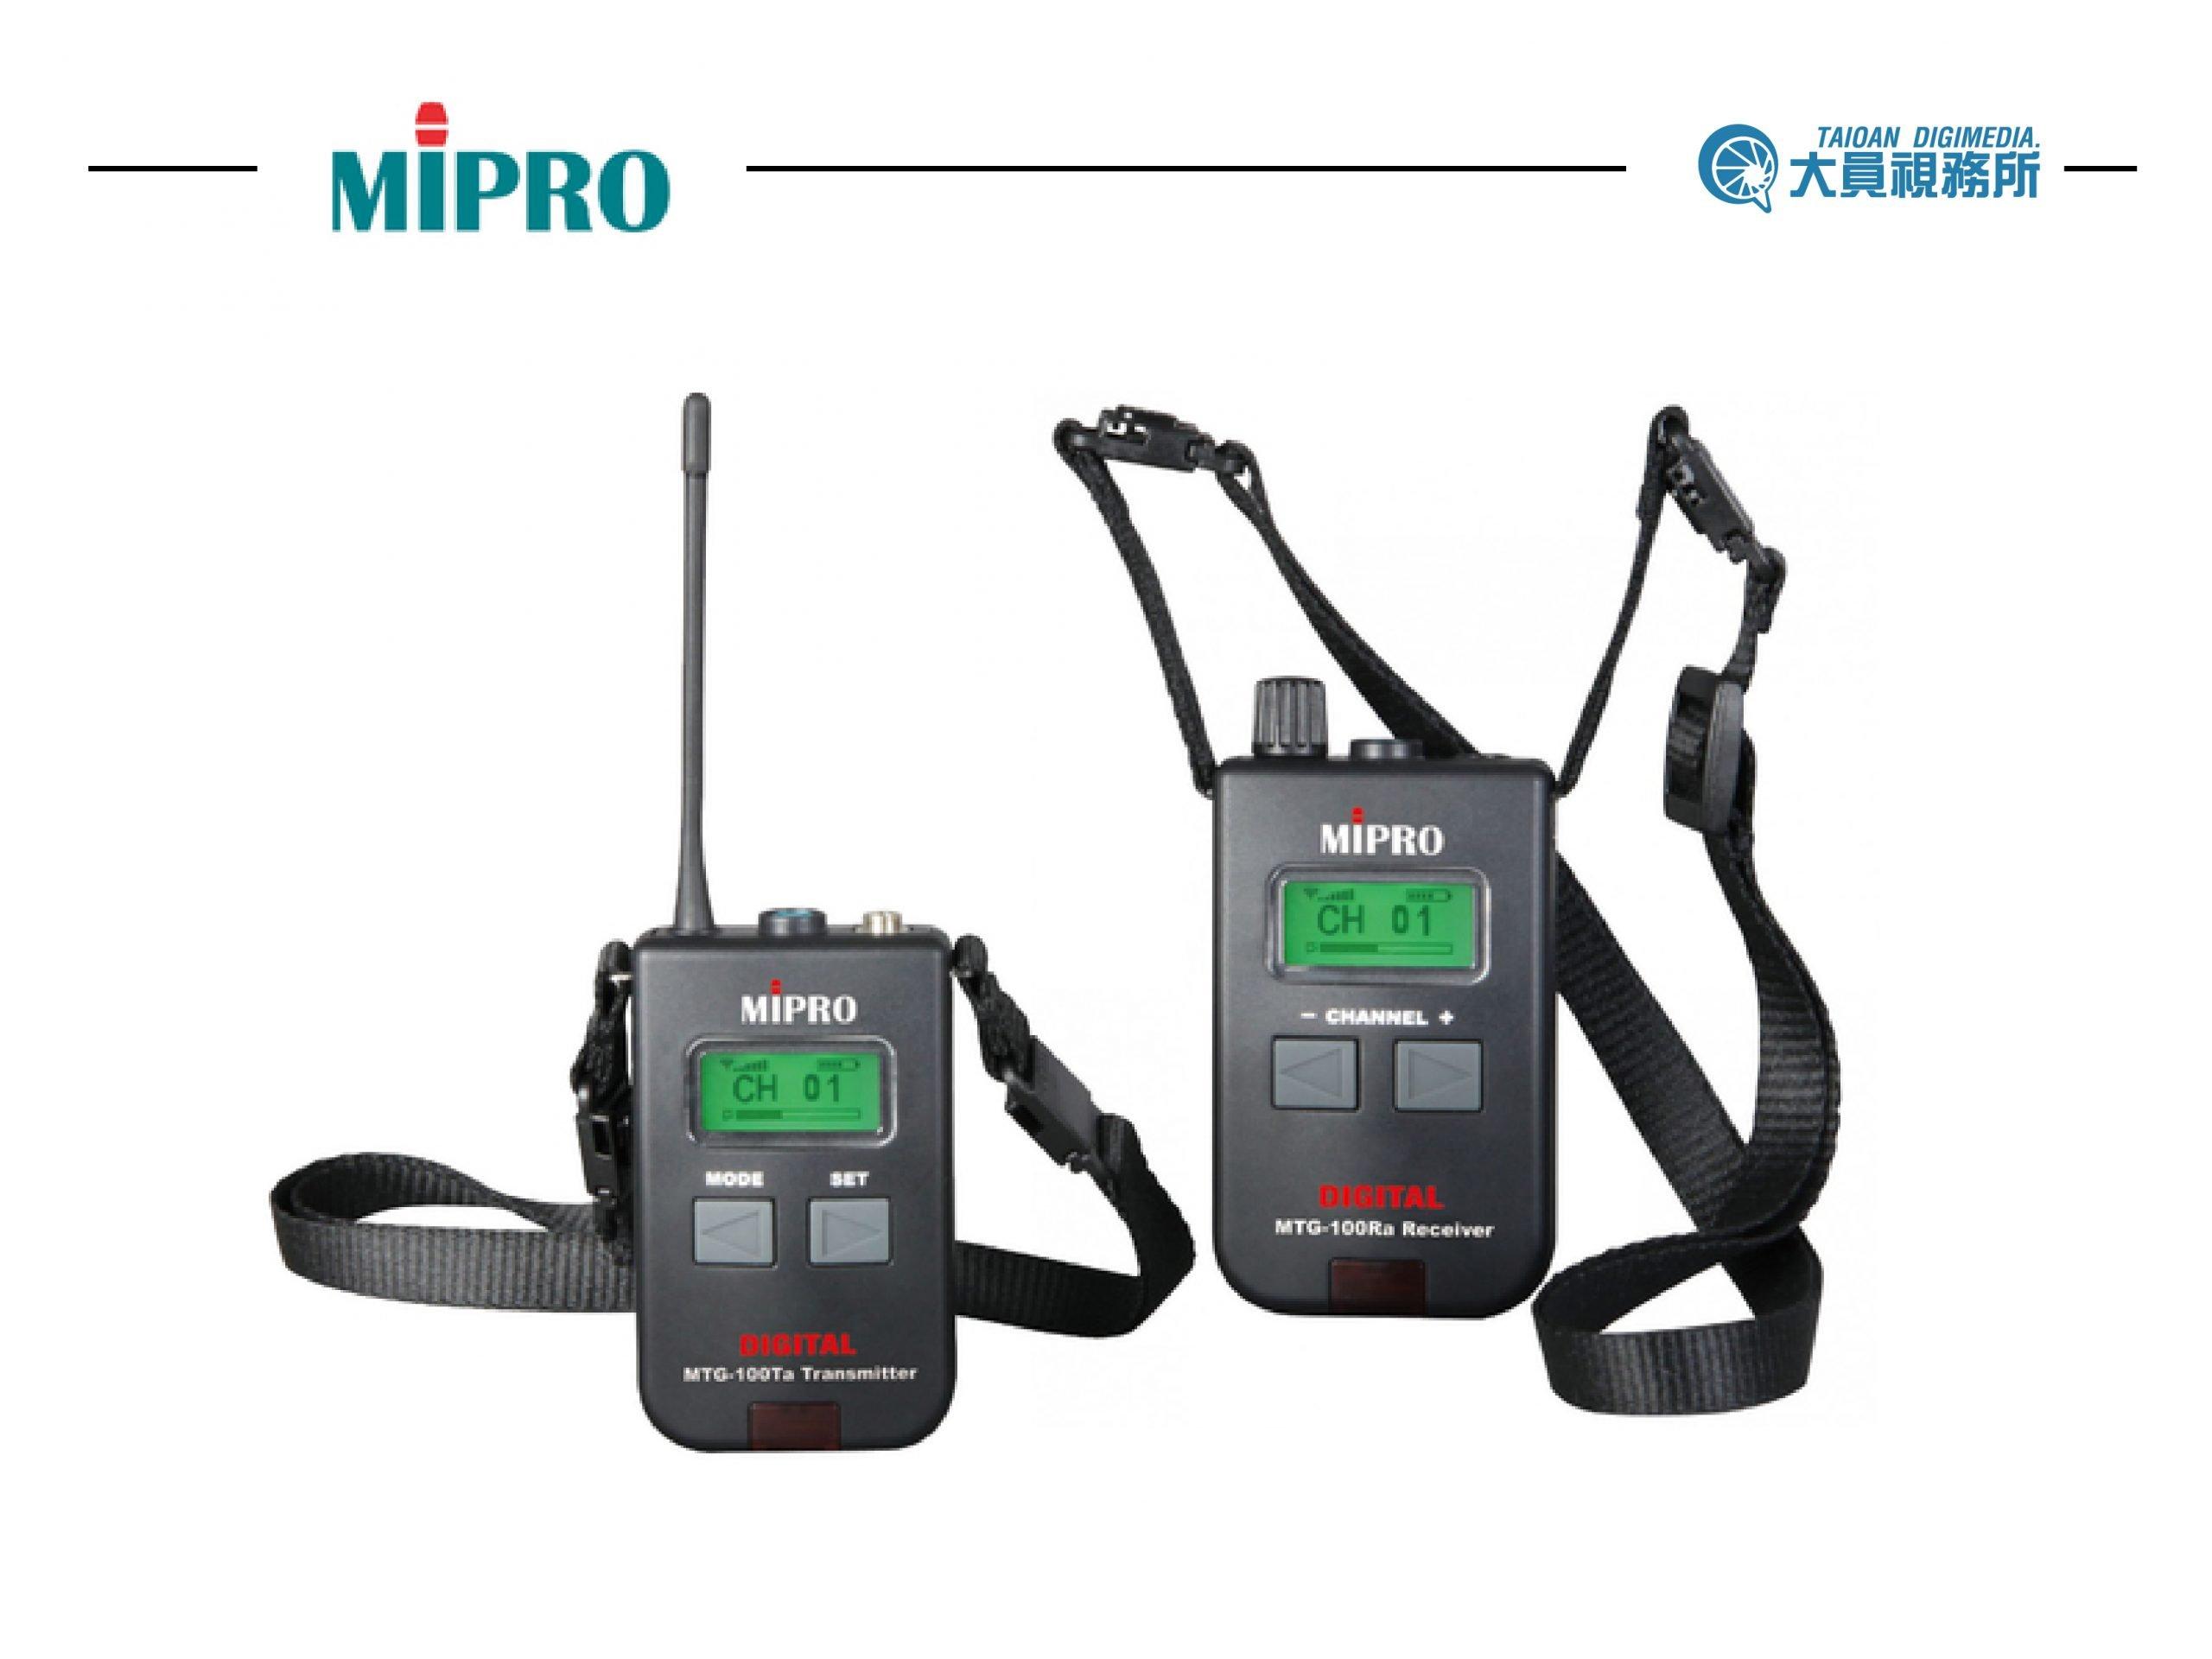 【MIPRO】MTG-100一對五無線傳輸系統